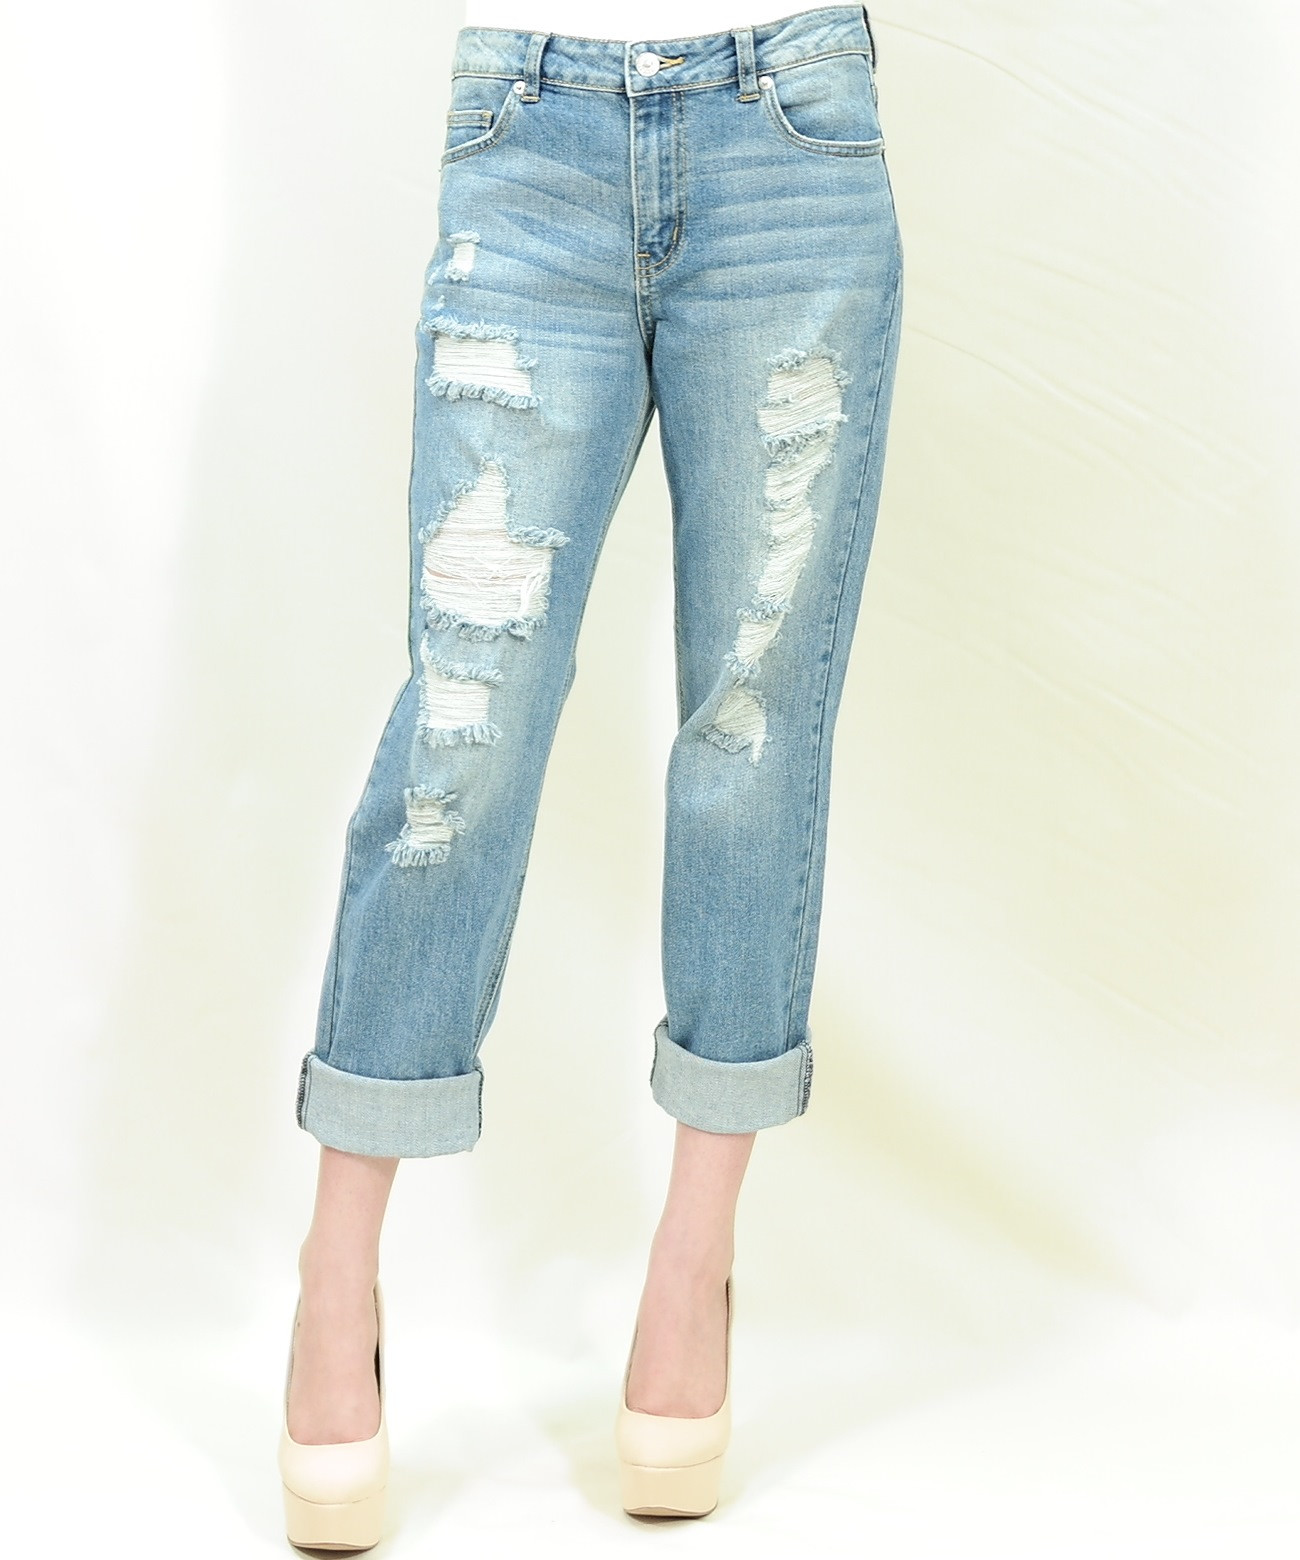 Distressed boyfriend jeans – Pinkracks